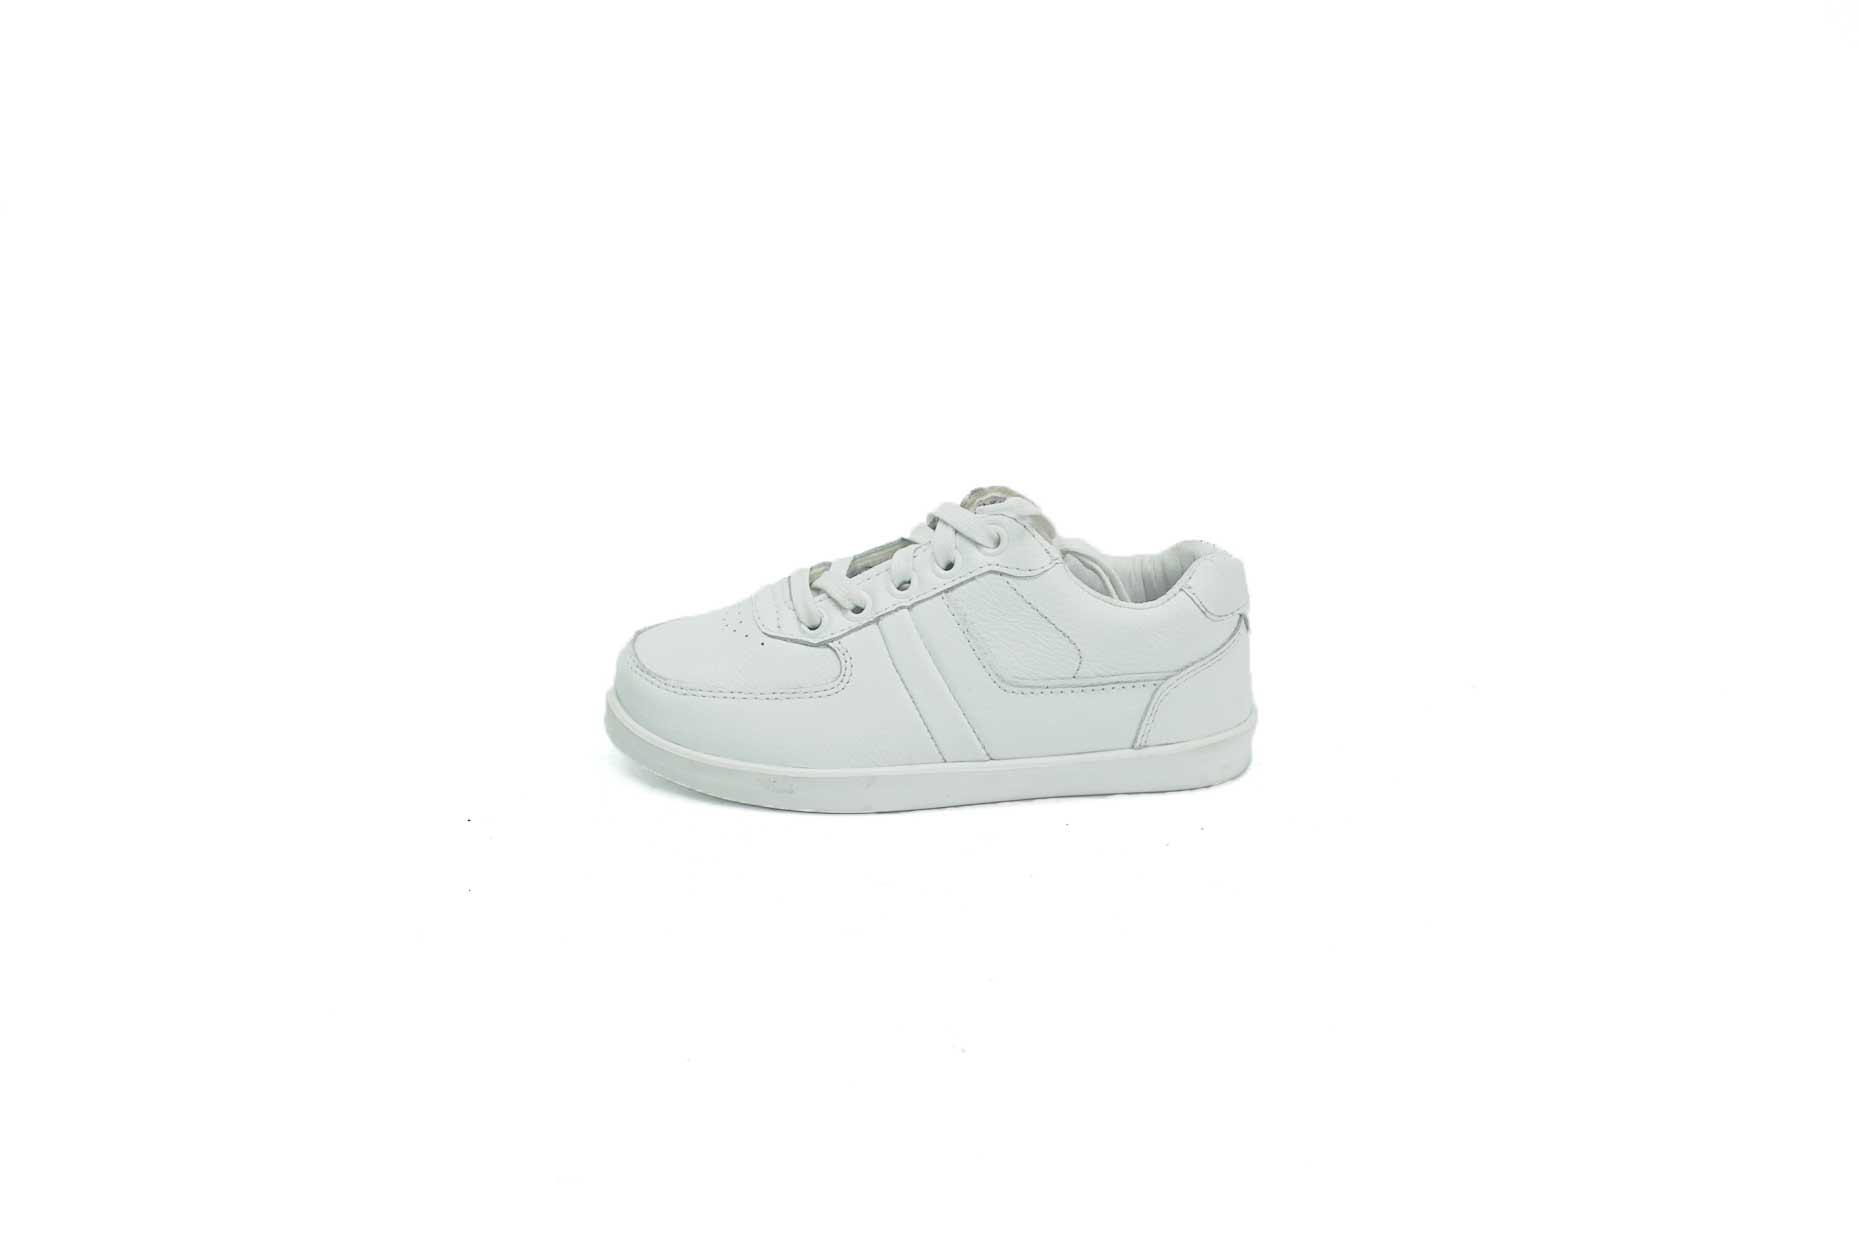 a53873c6 ... Zapatos; /; Zapatos Blancos Gruesos. 🔍. Prev